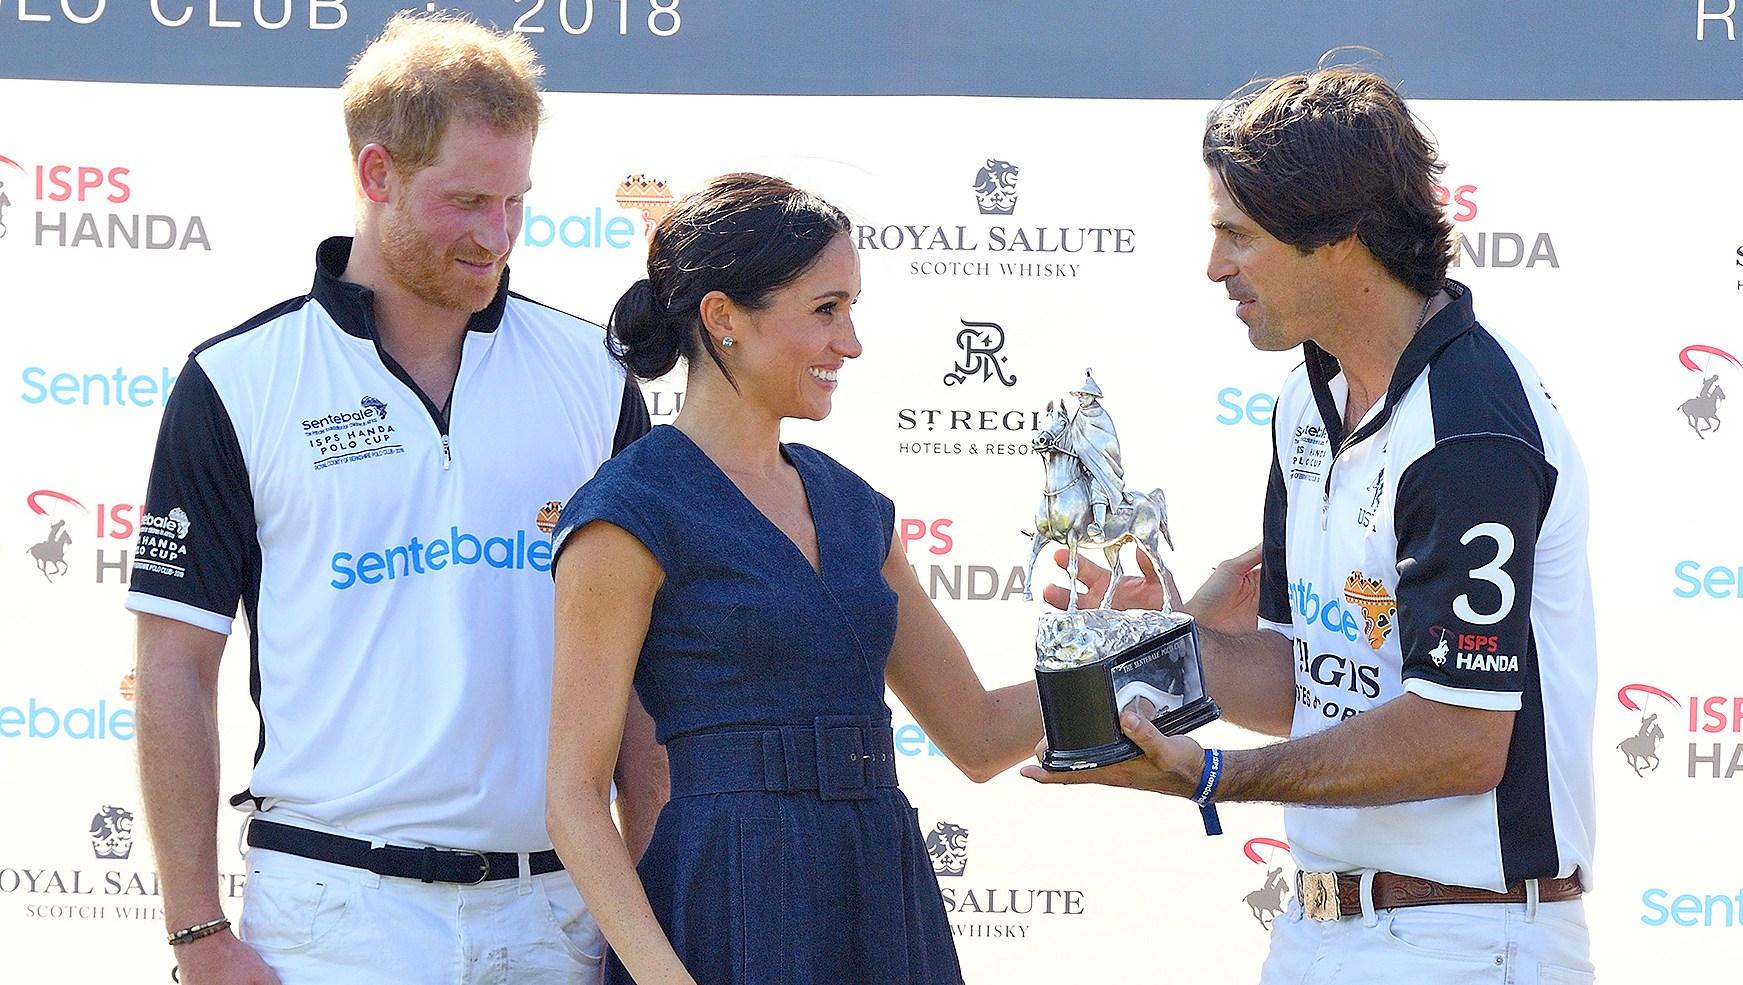 Prince William, Duchess Meghan of Sussex, Nacho, Ignacio Figueras, Trophy, Polo Club